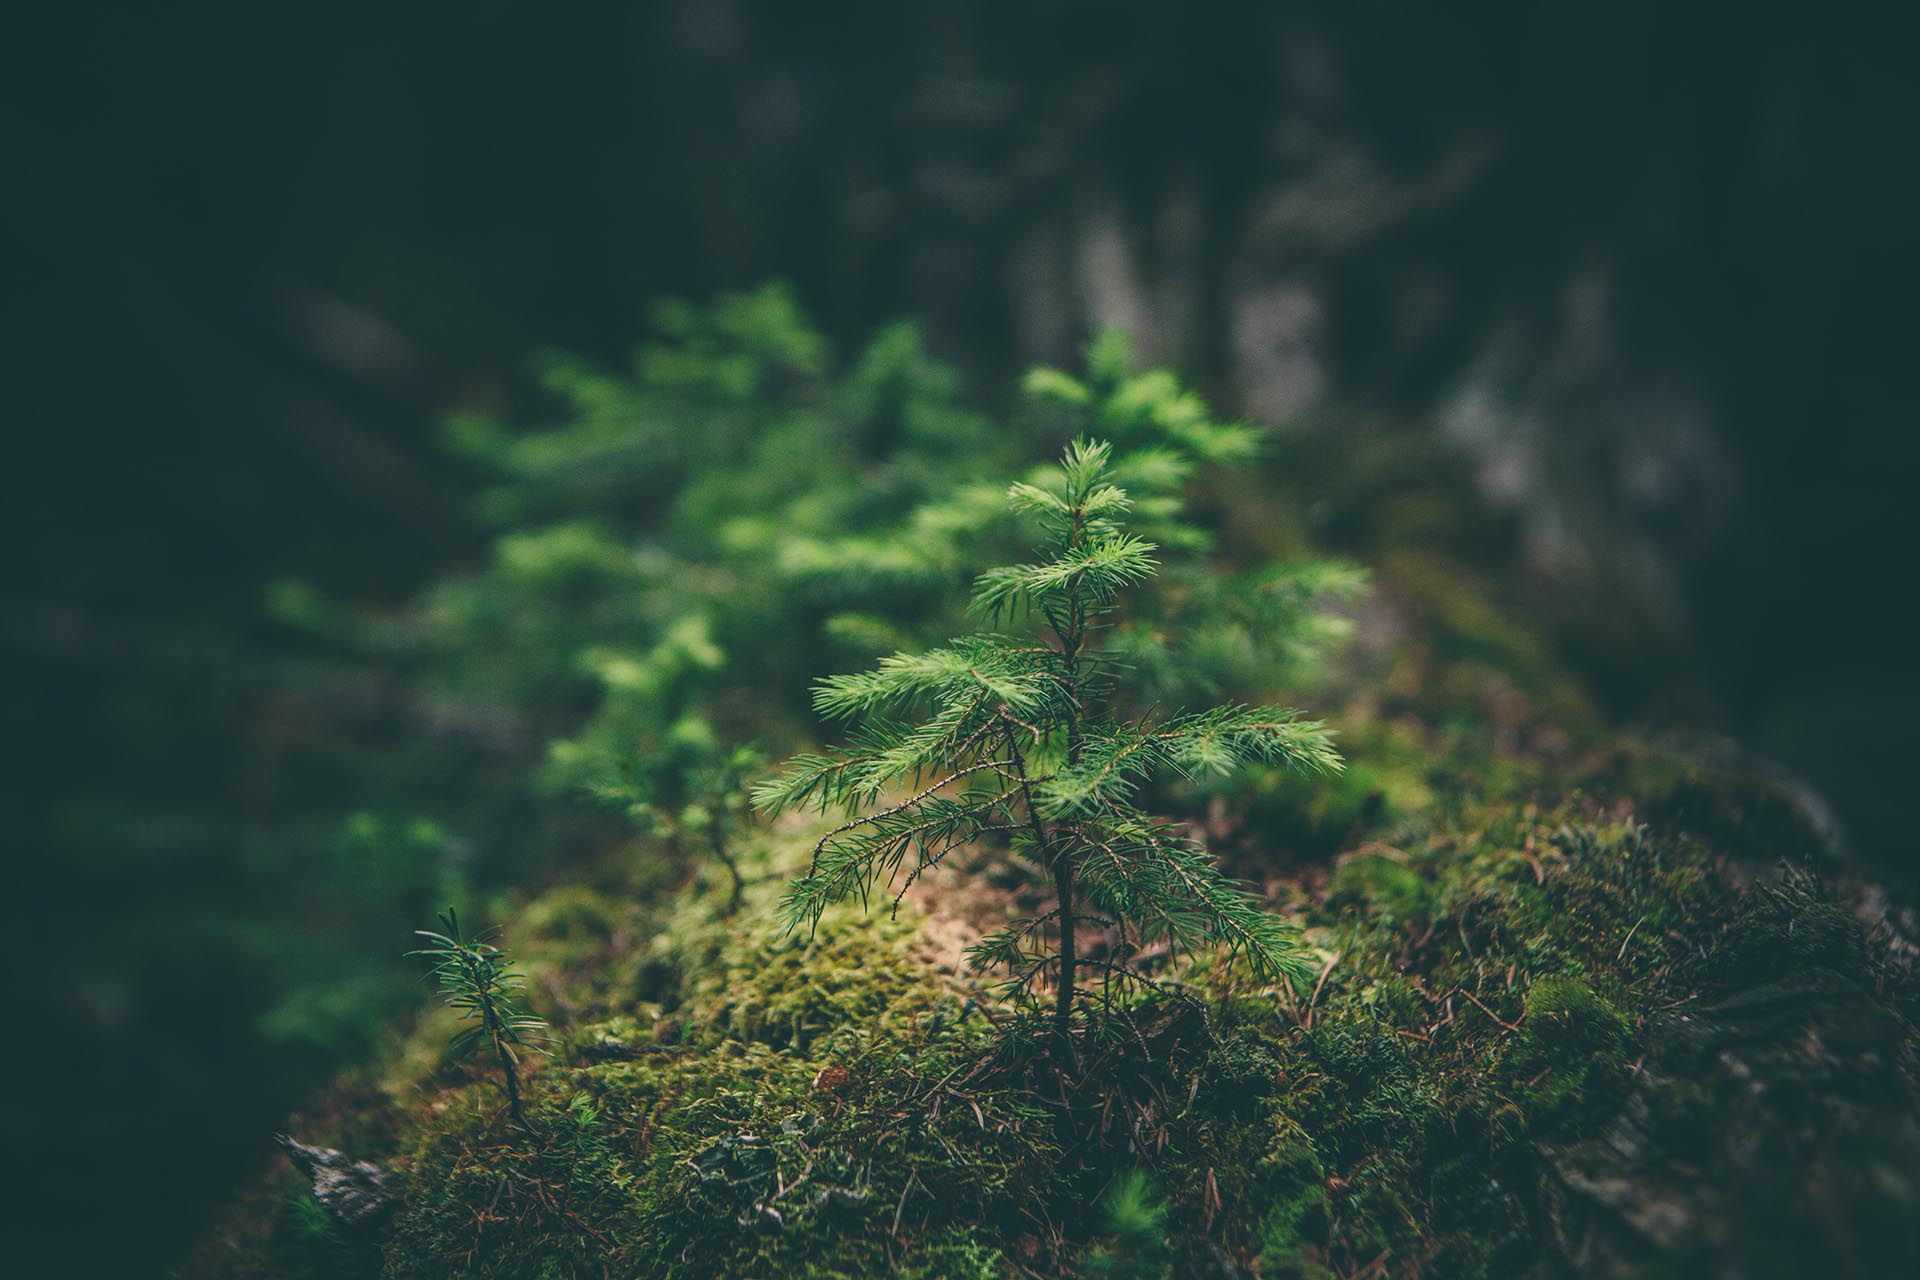 Close up a a pine tree sapling